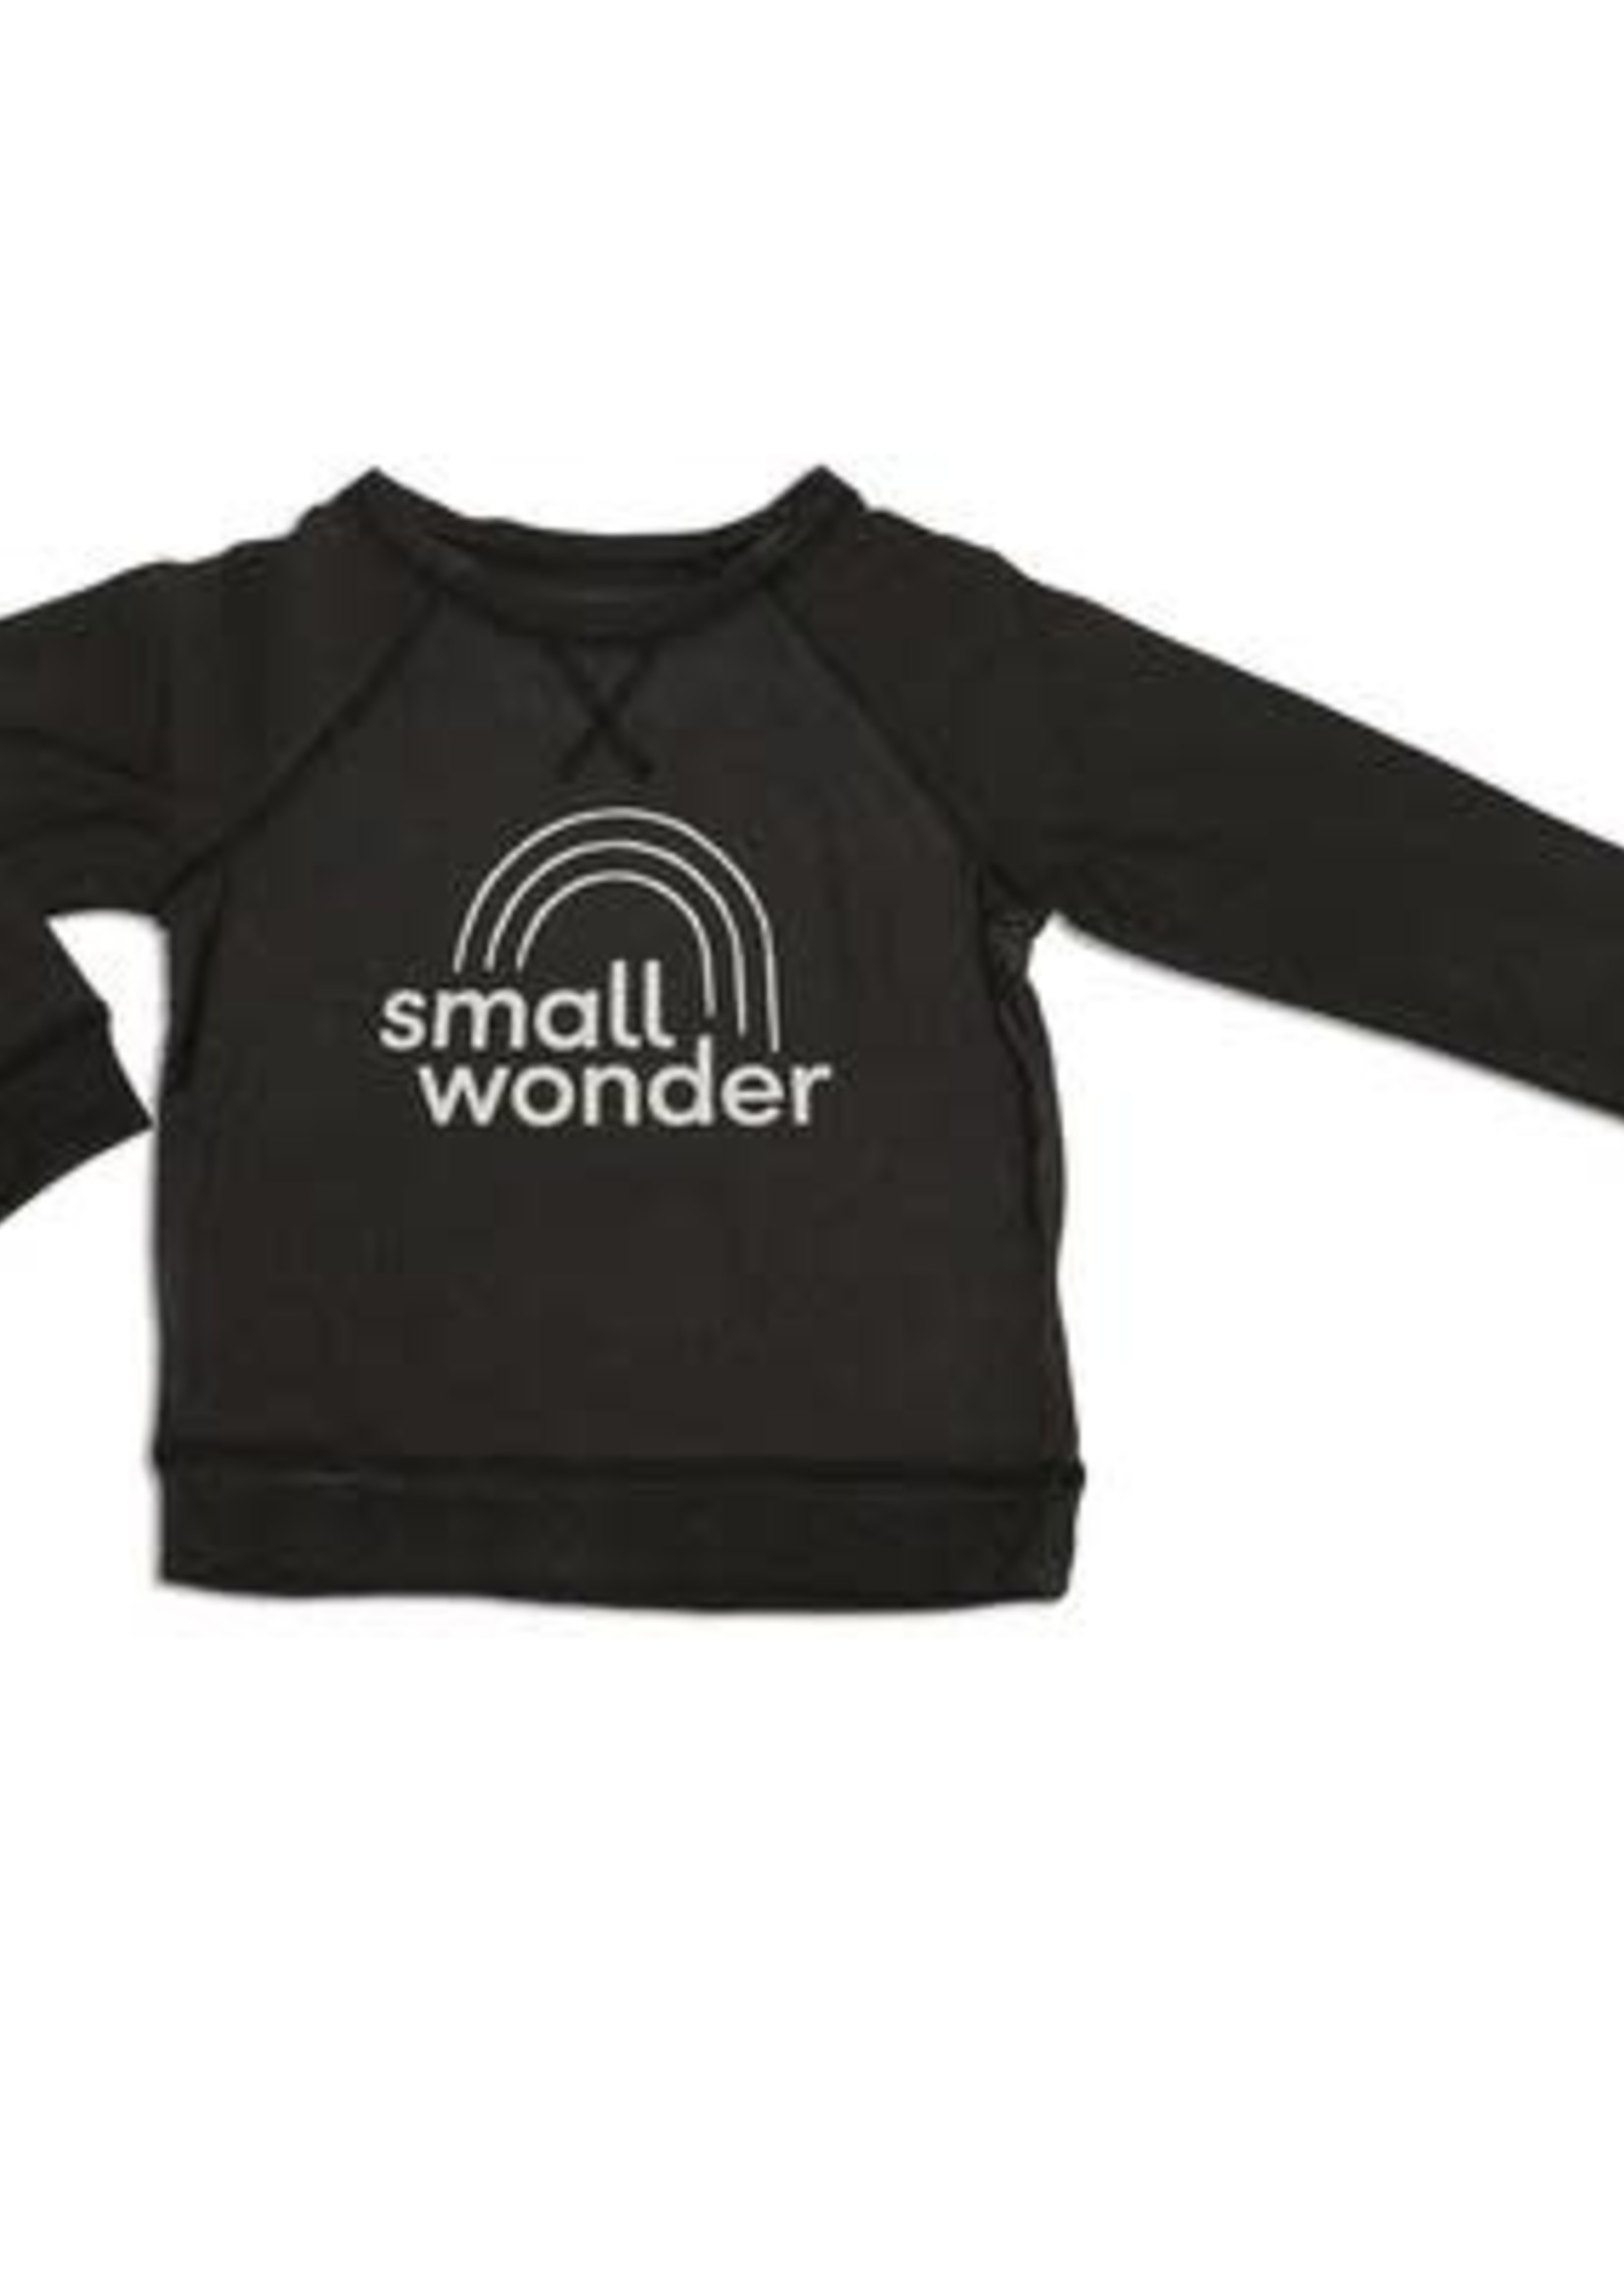 silkberry SB Bamboo Fleece Sweater (Small Wonder)